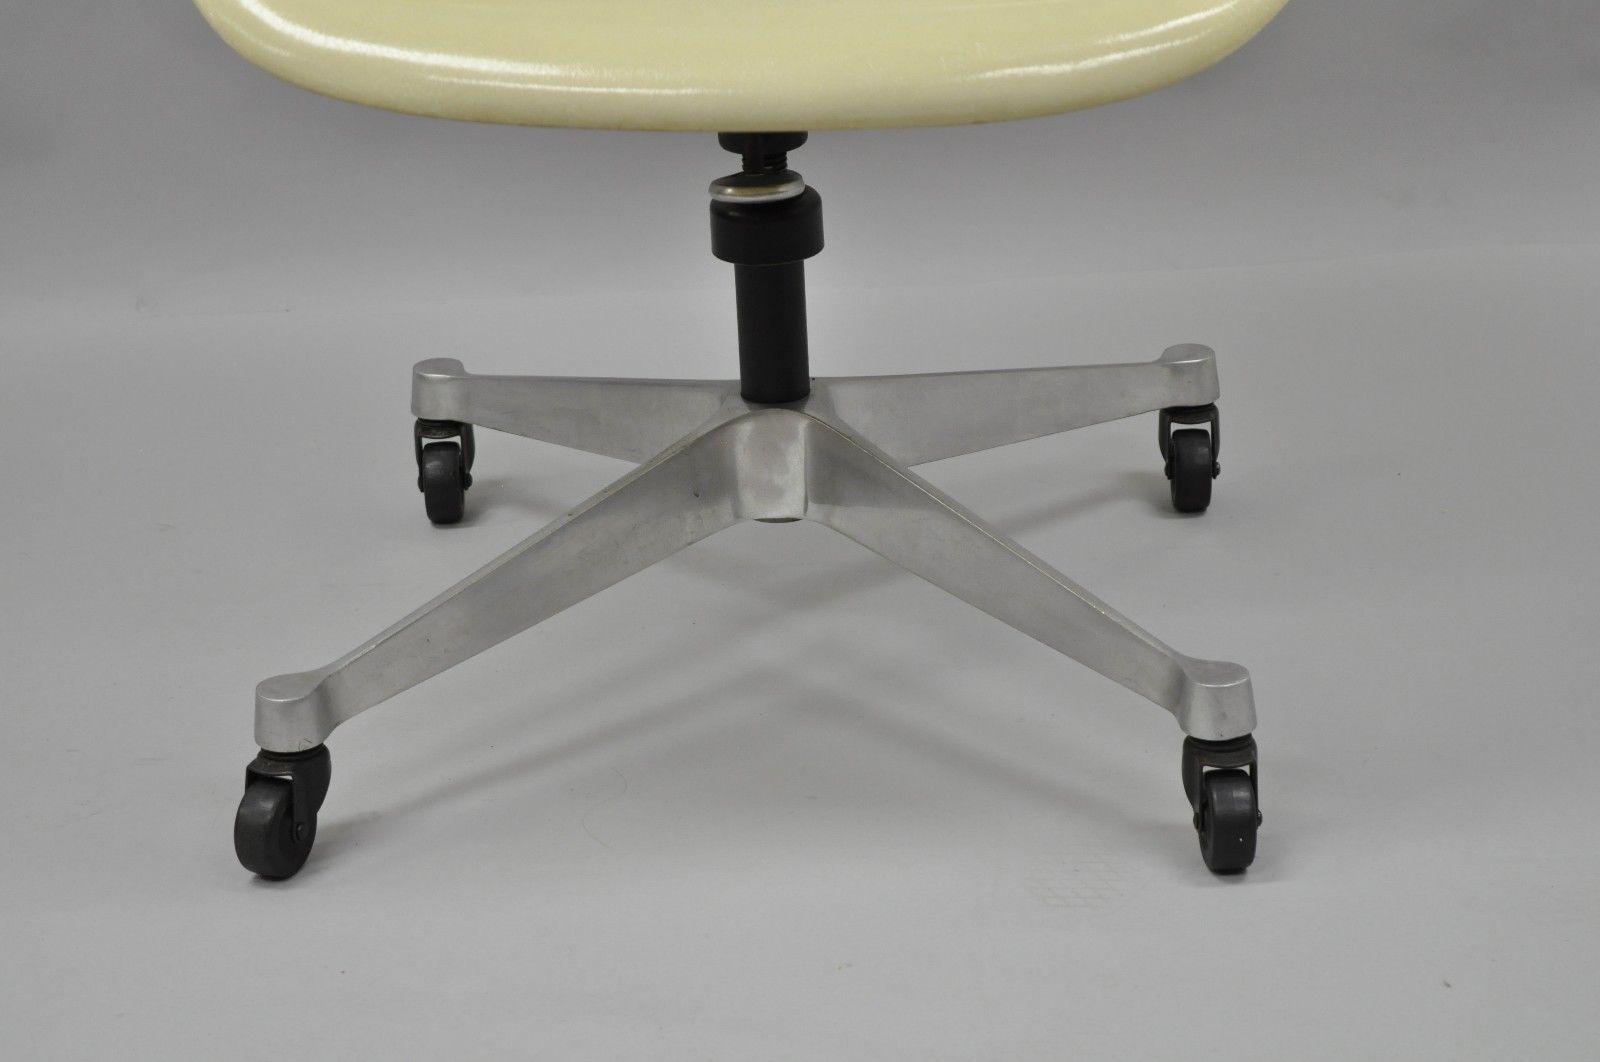 Herman Miller Vintage Herman Miller Eames Fiberglass Shell Pearl Beige  Rolling Desk Office Chair For Sale